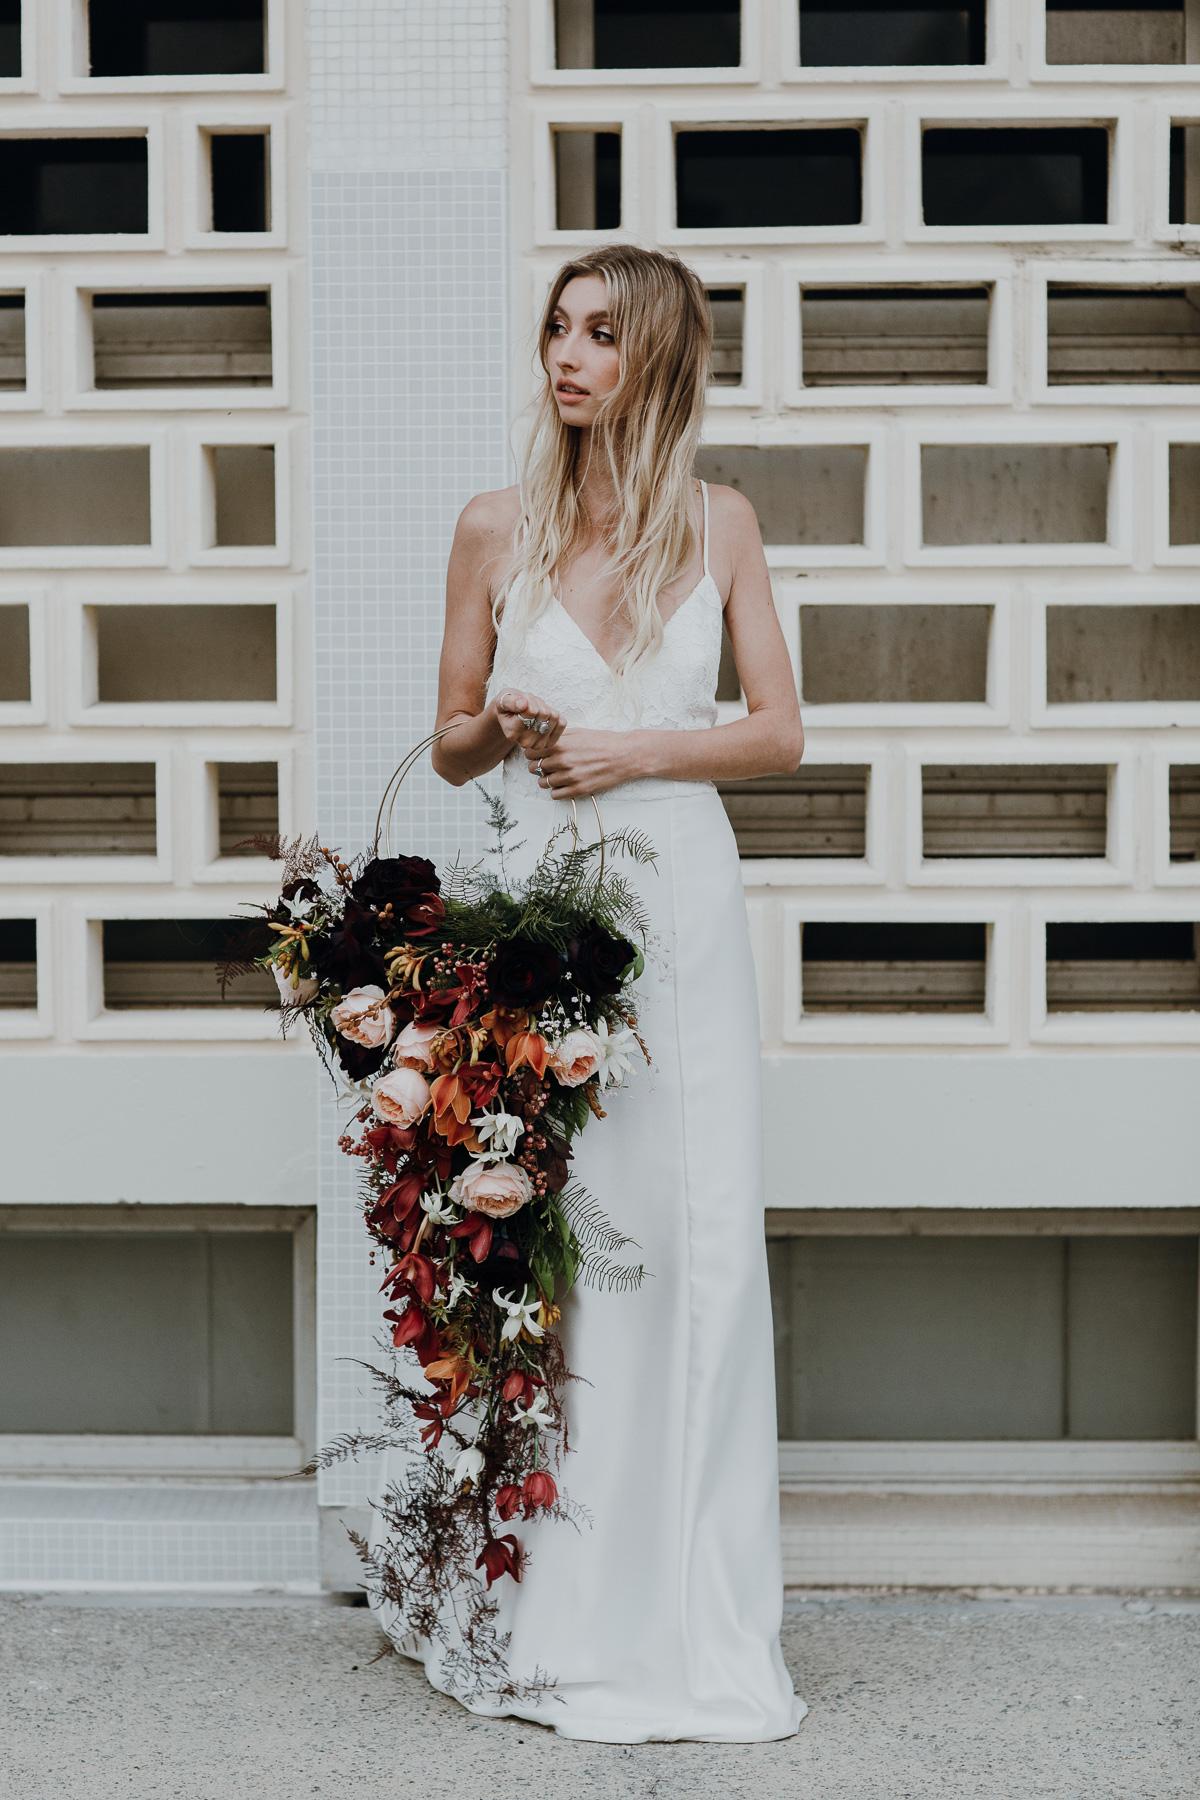 The Bloom Romantic-Peggy Saas Perth Wedding Photographer-Same Sex Wedding-60.jpg